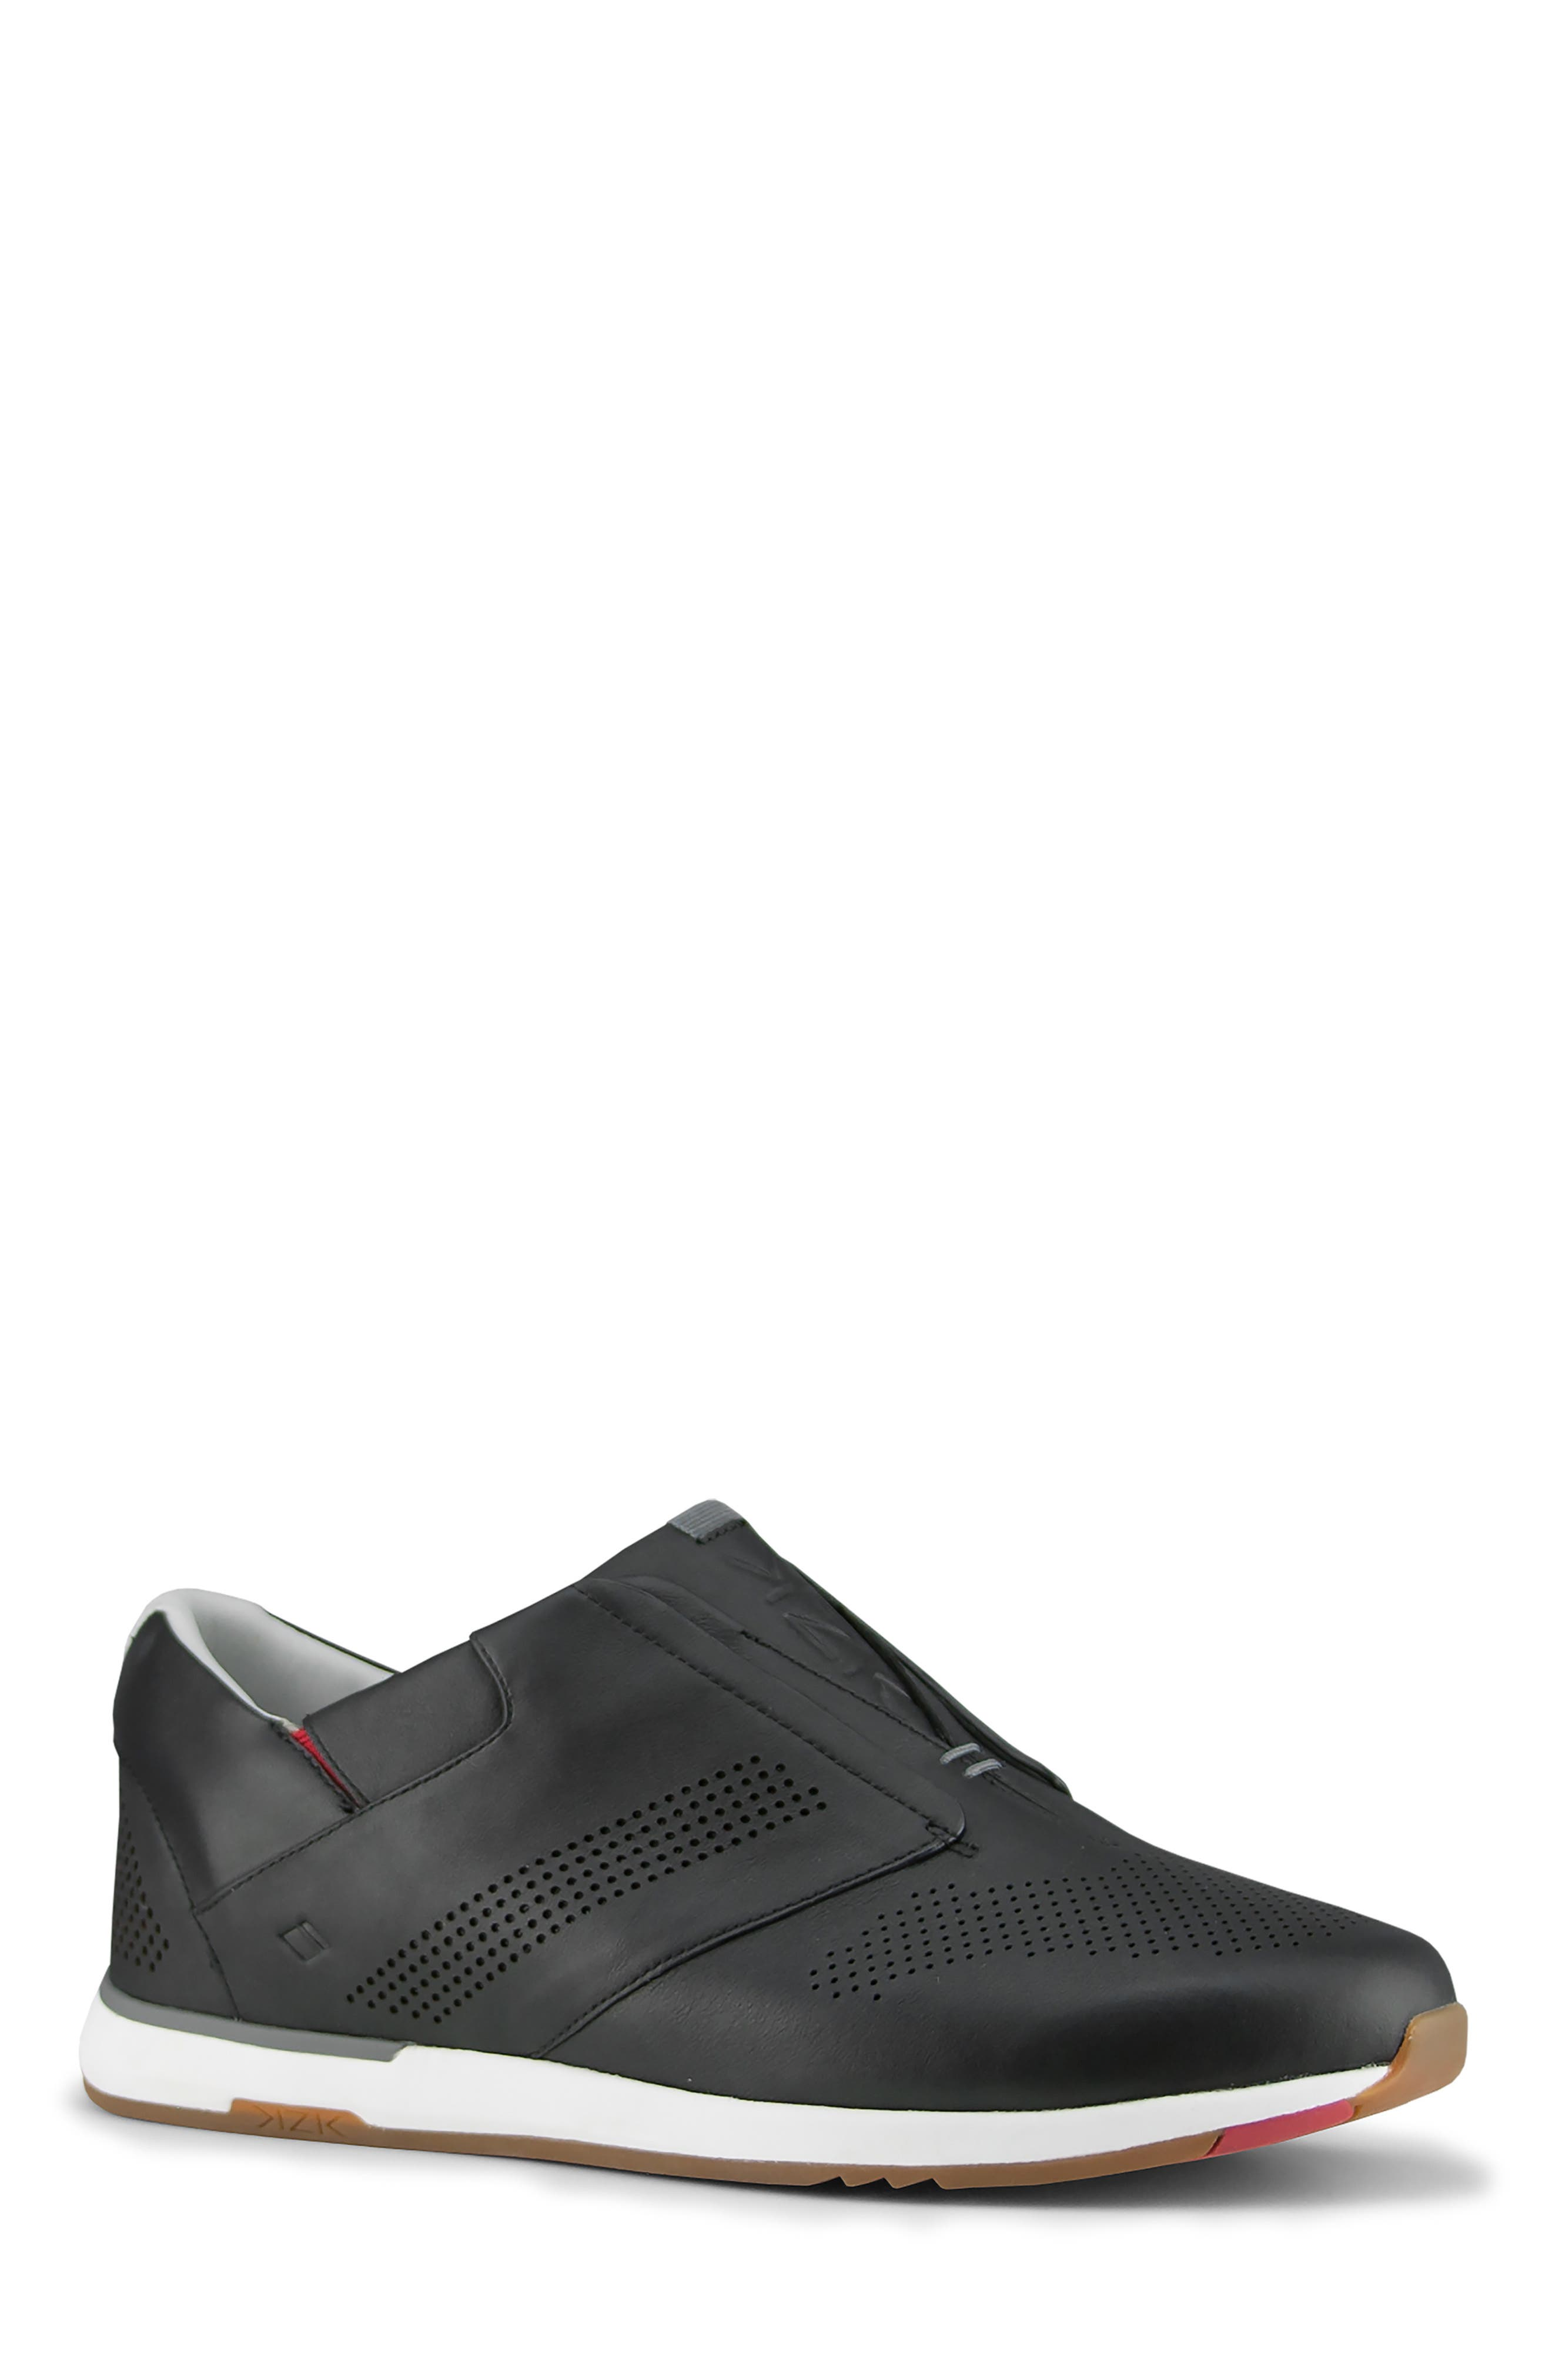 KIZIK Dubai Slip-On Sneaker, Main, color, BLACK LEATHER